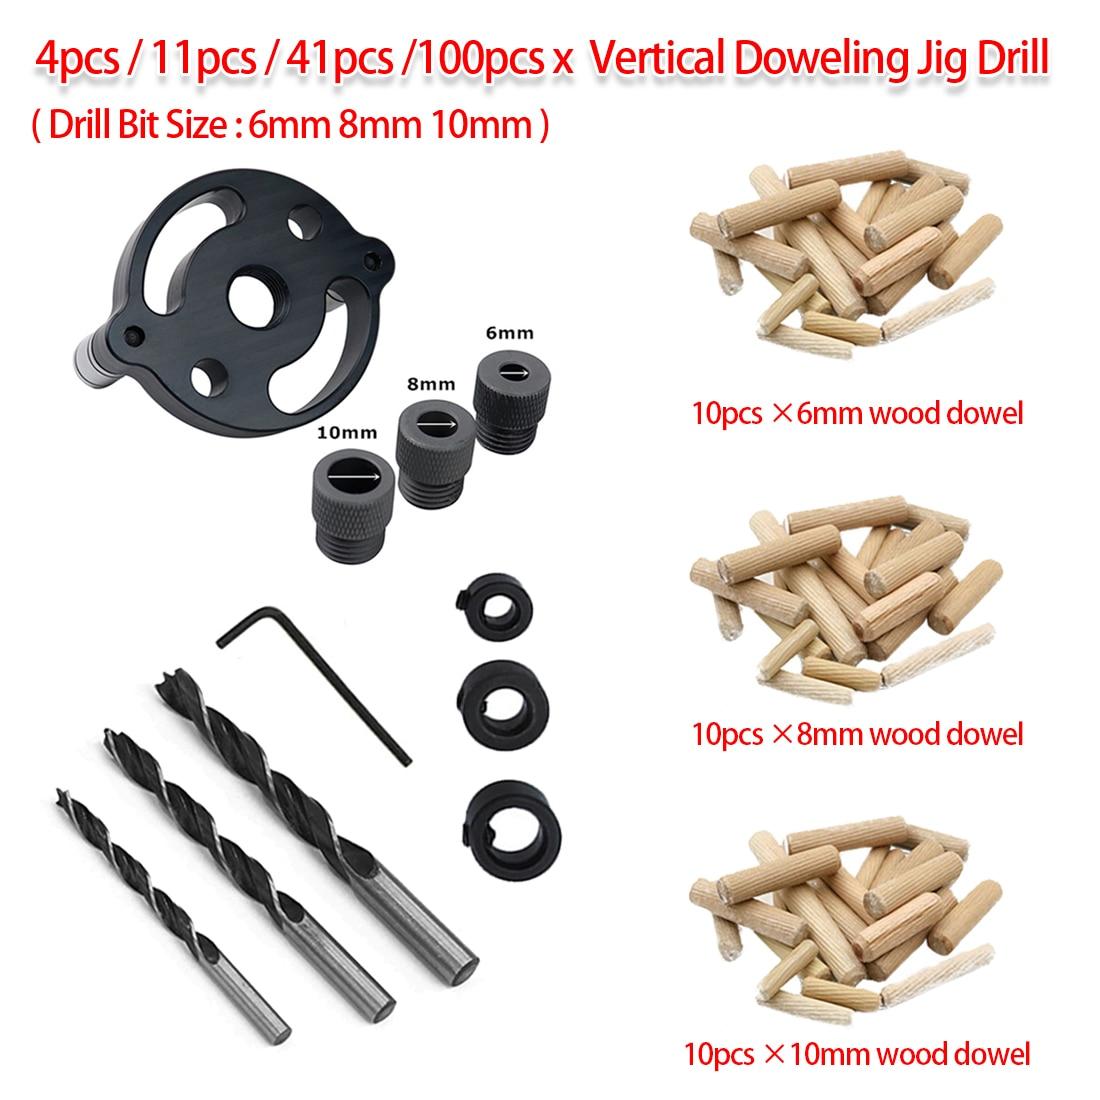 Doweling Jig 4pcs/11pcs/41pcs/100pcs Pocket Hole Tool Wood Vertical Drilling Detachable Locator For Hole Puncher Carpentry Tool